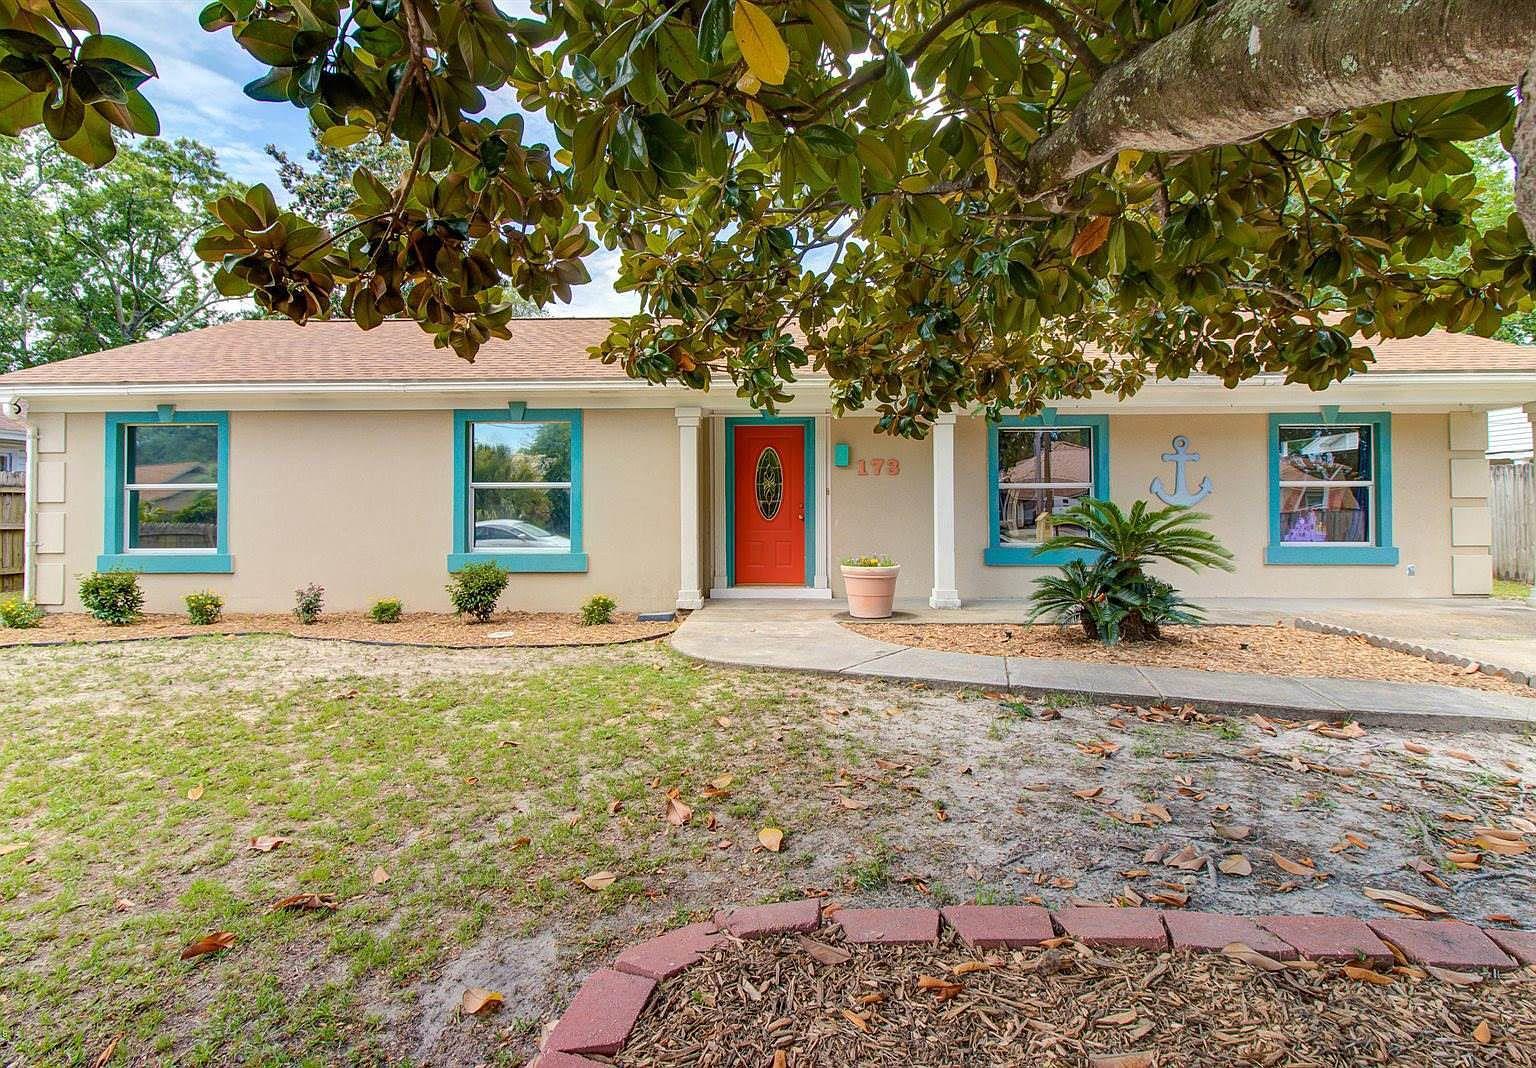 173 Beachview Ave Biloxi Ms 39531 Mls 362639 Zillow